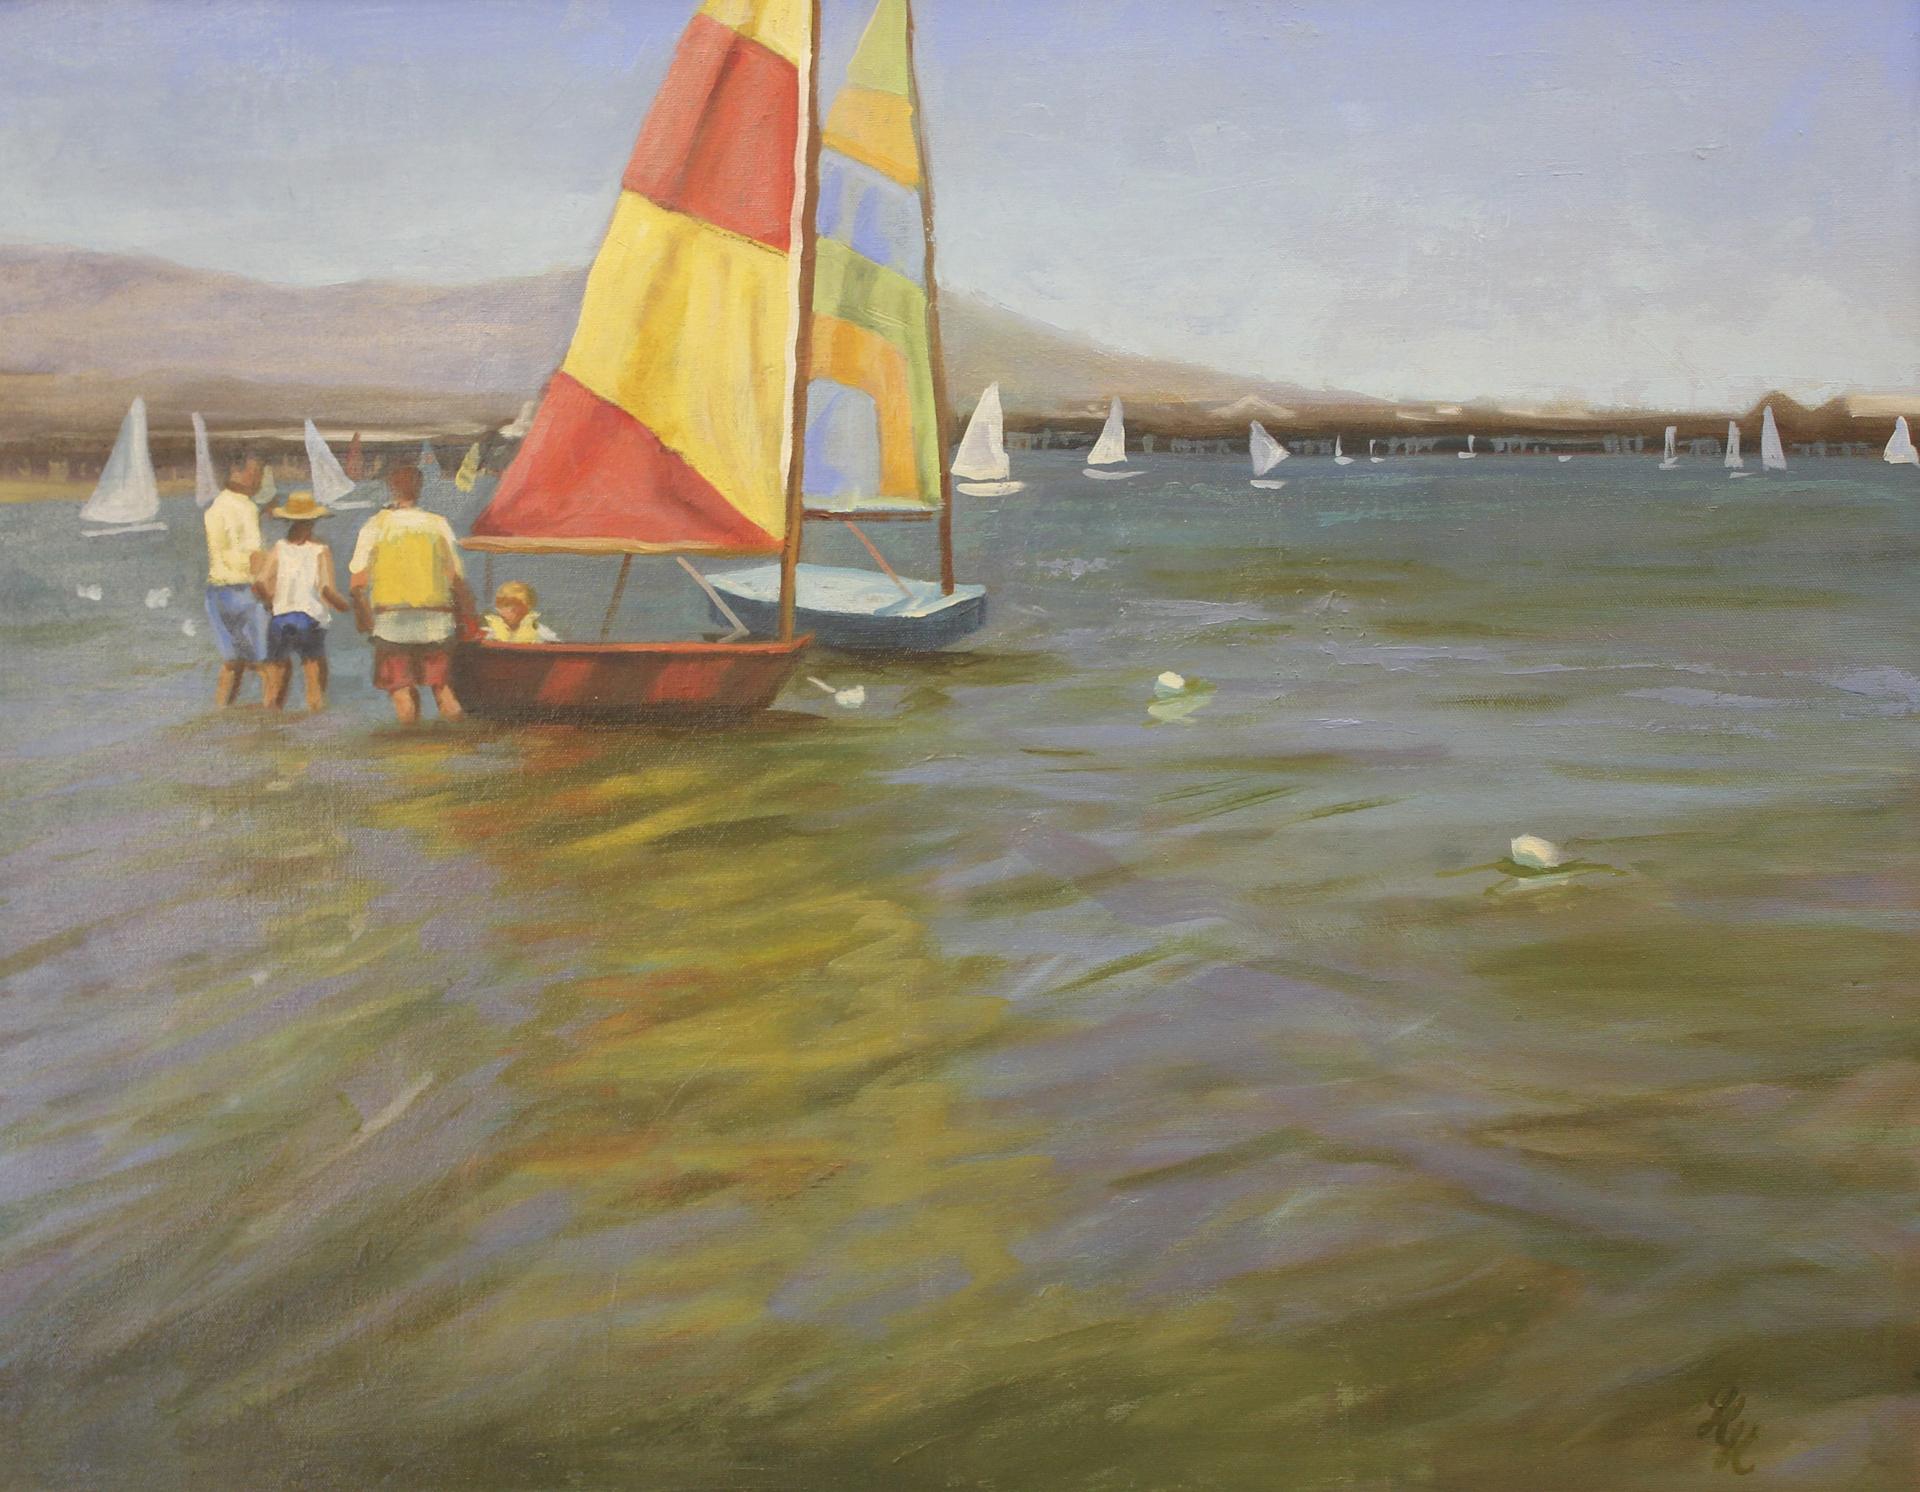 Sunday Sails